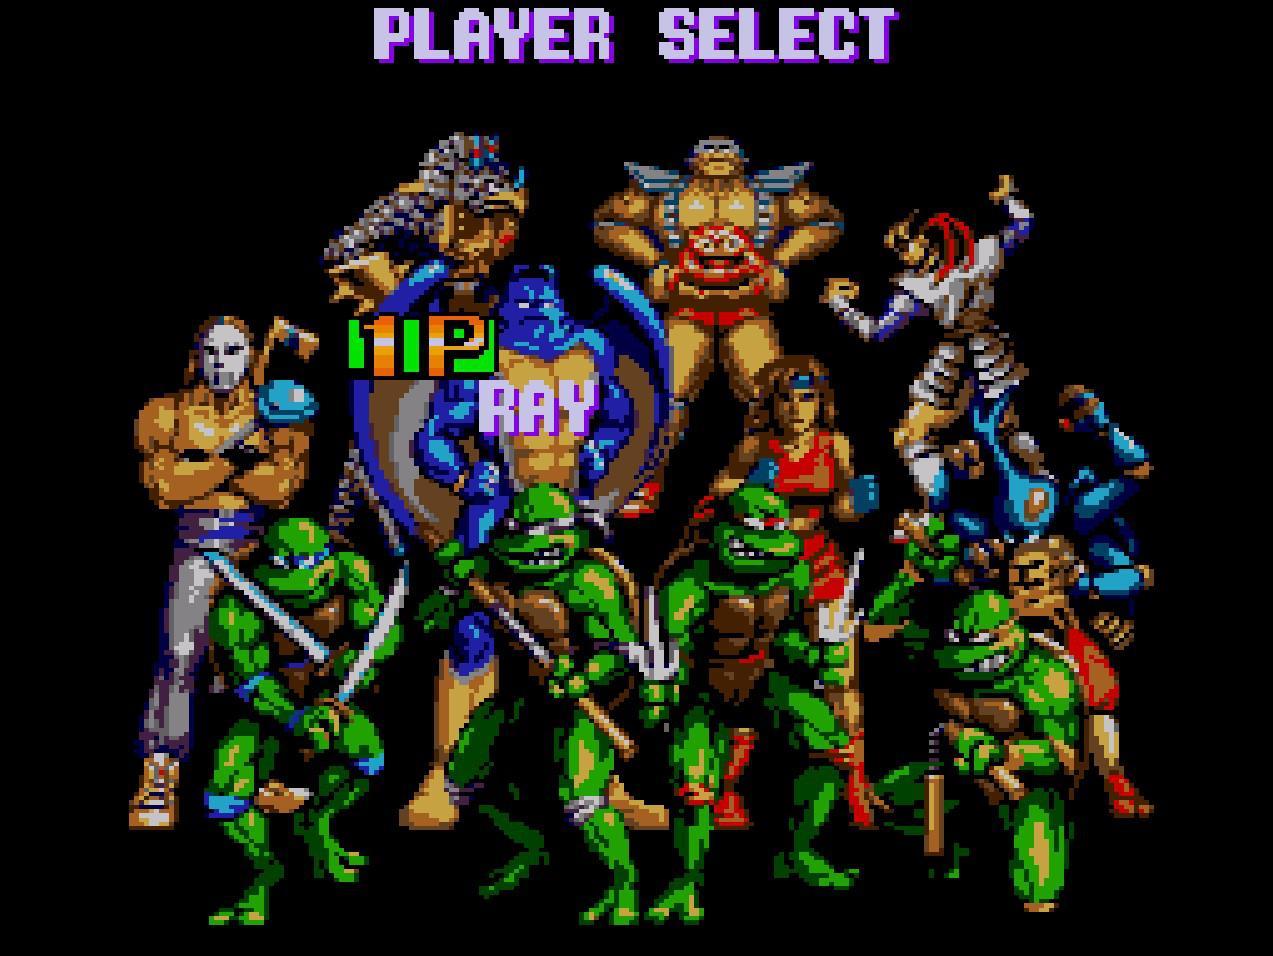 Teenage mutant ninja turtles - Fighters- generacion xbox